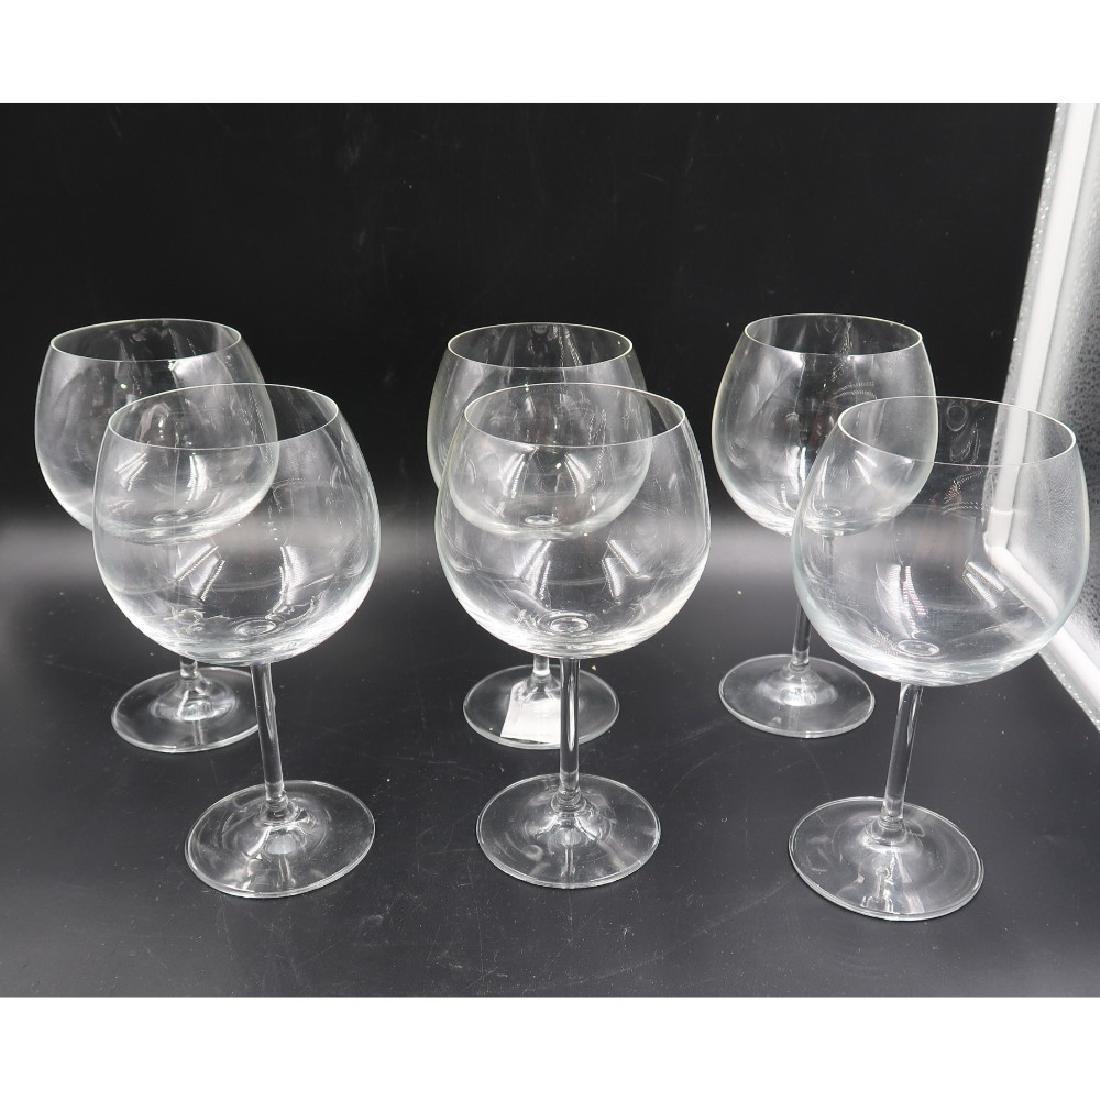 6 crystal wine glasses (balloon)